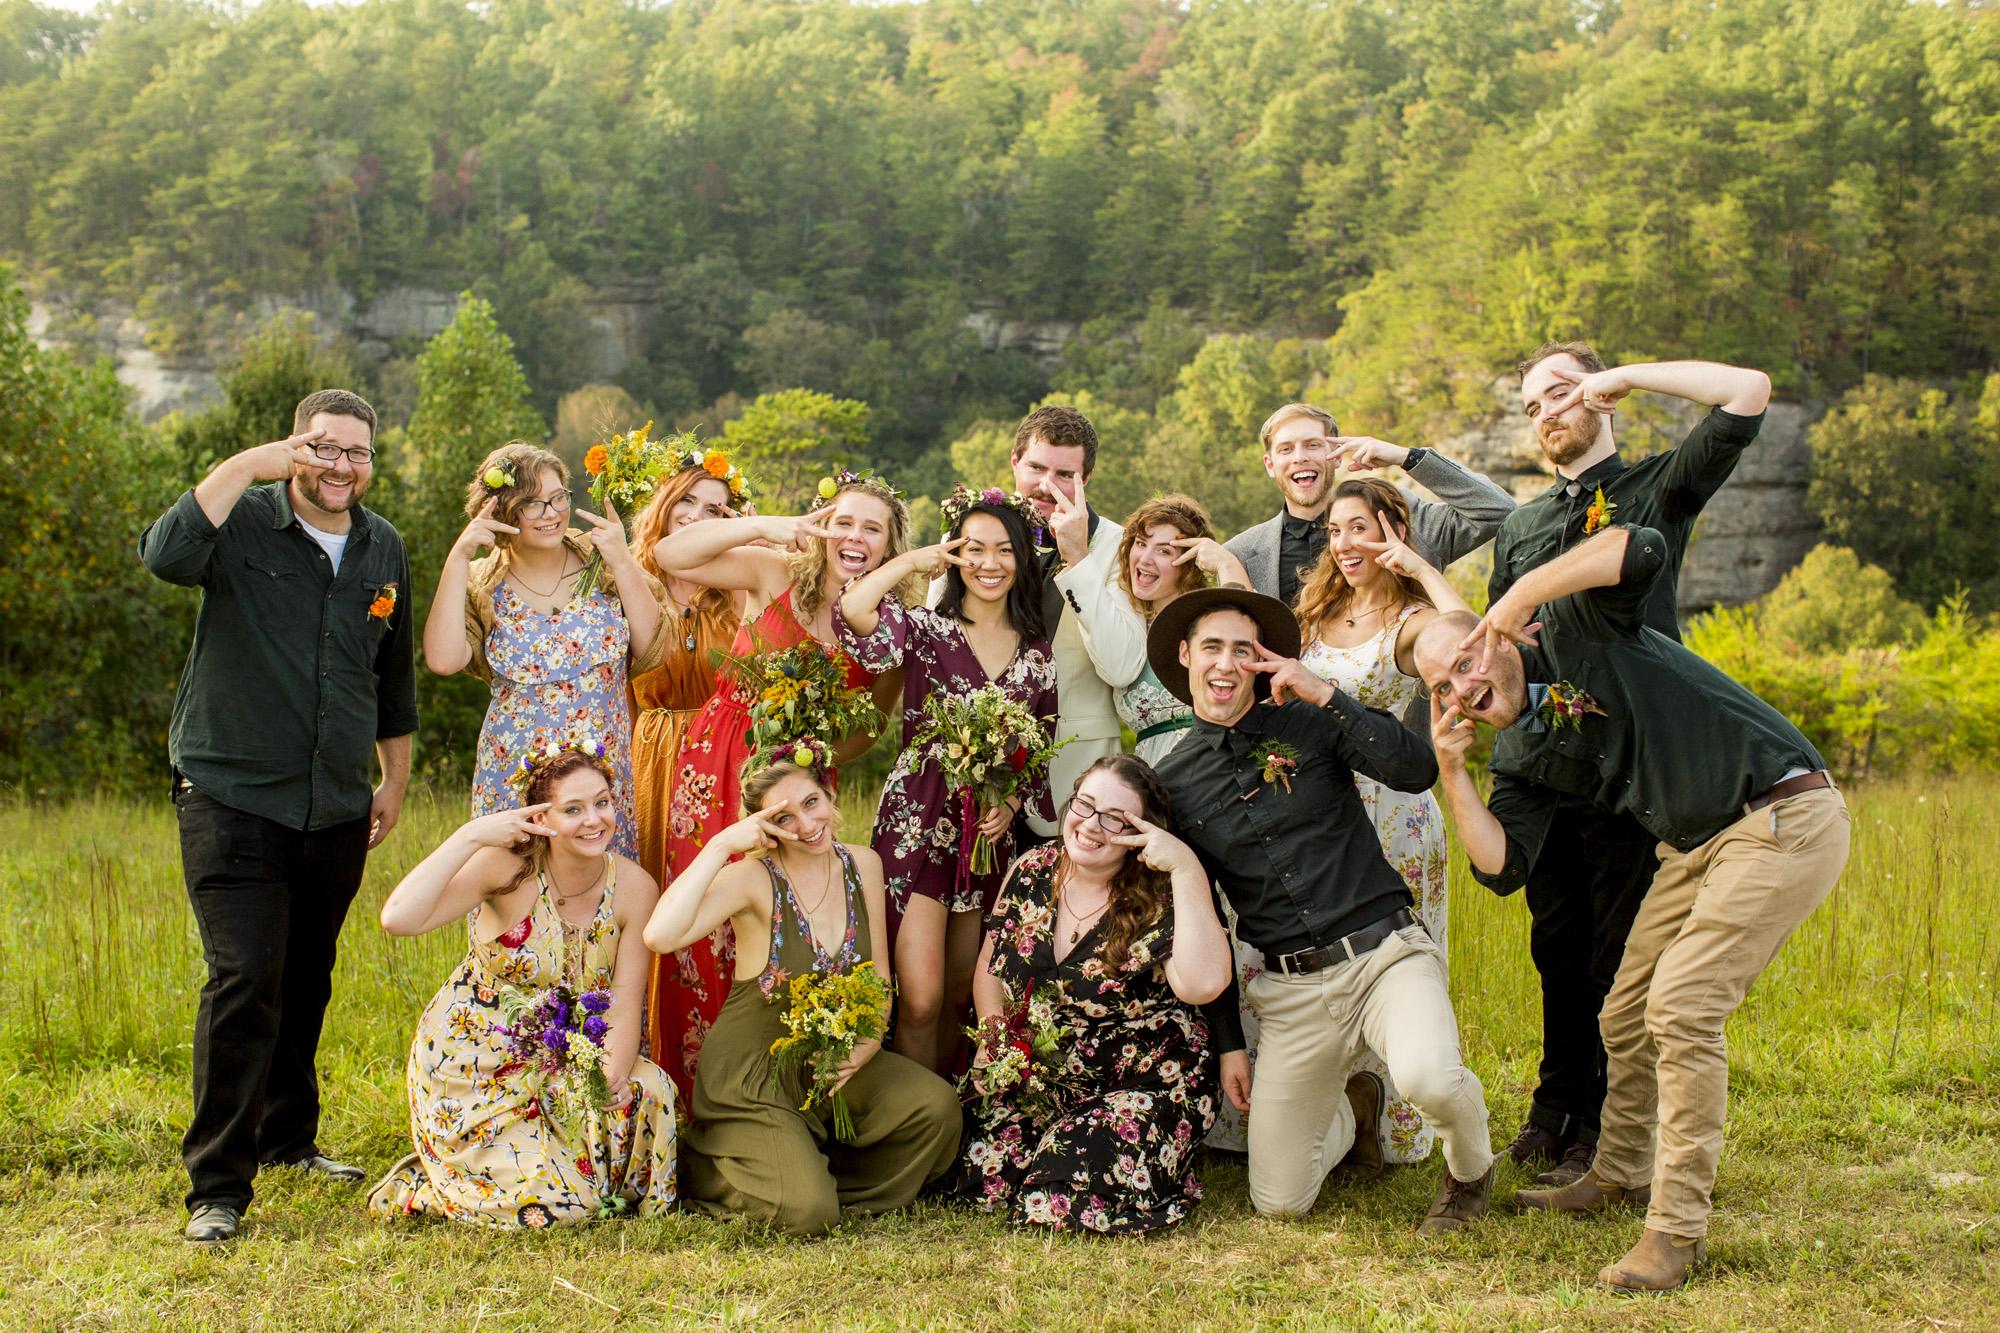 Seriously_Sabrina_Photography_Red_River_Gorge_Kentucky_Wedding_ShawnDana149.jpg